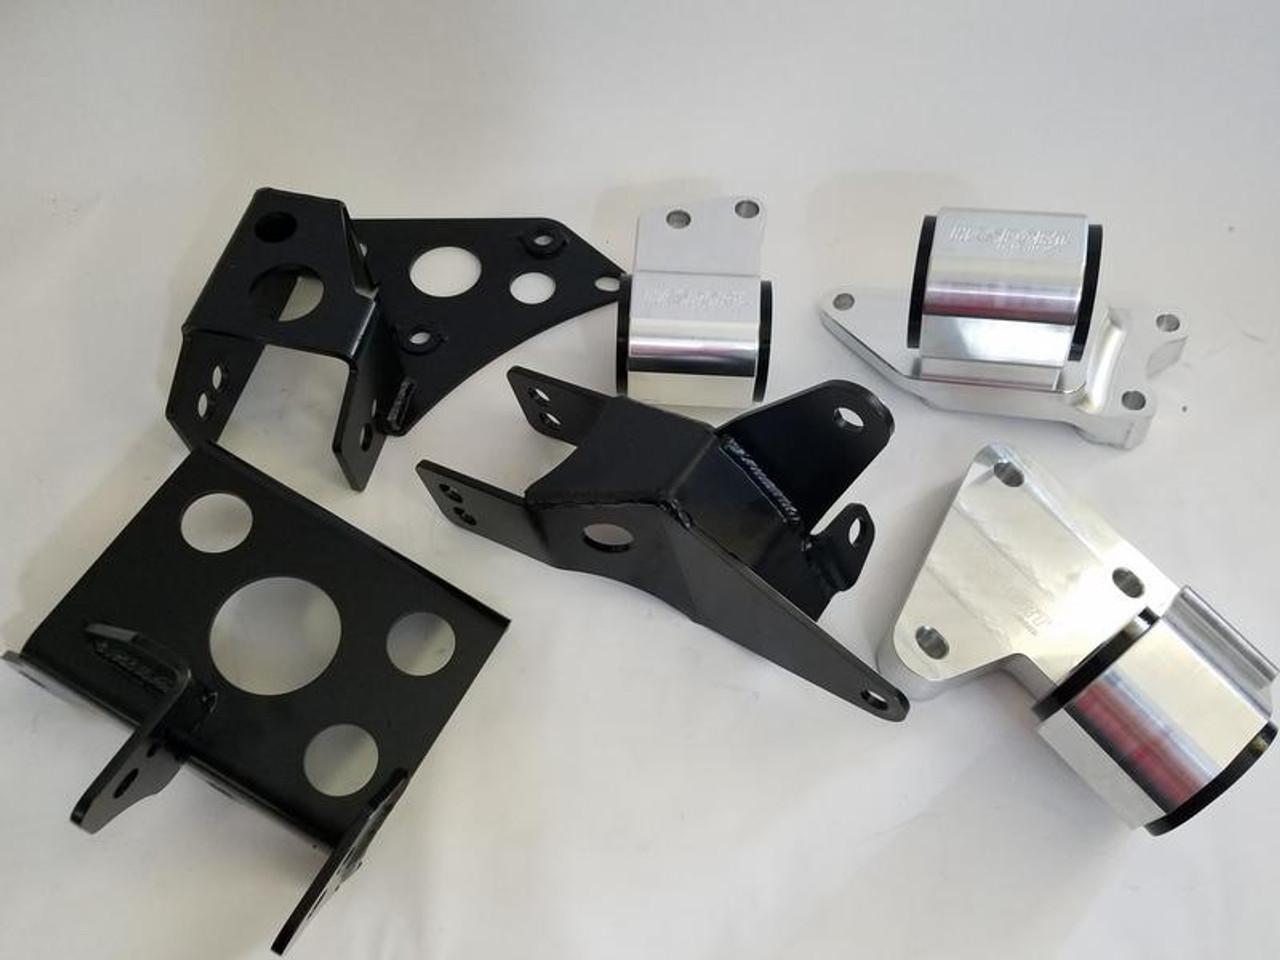 Hasport - EK Dual Height K-Series Mount Kit (12-15' Civic Si 09-14' TSX  Transmission & AWD)